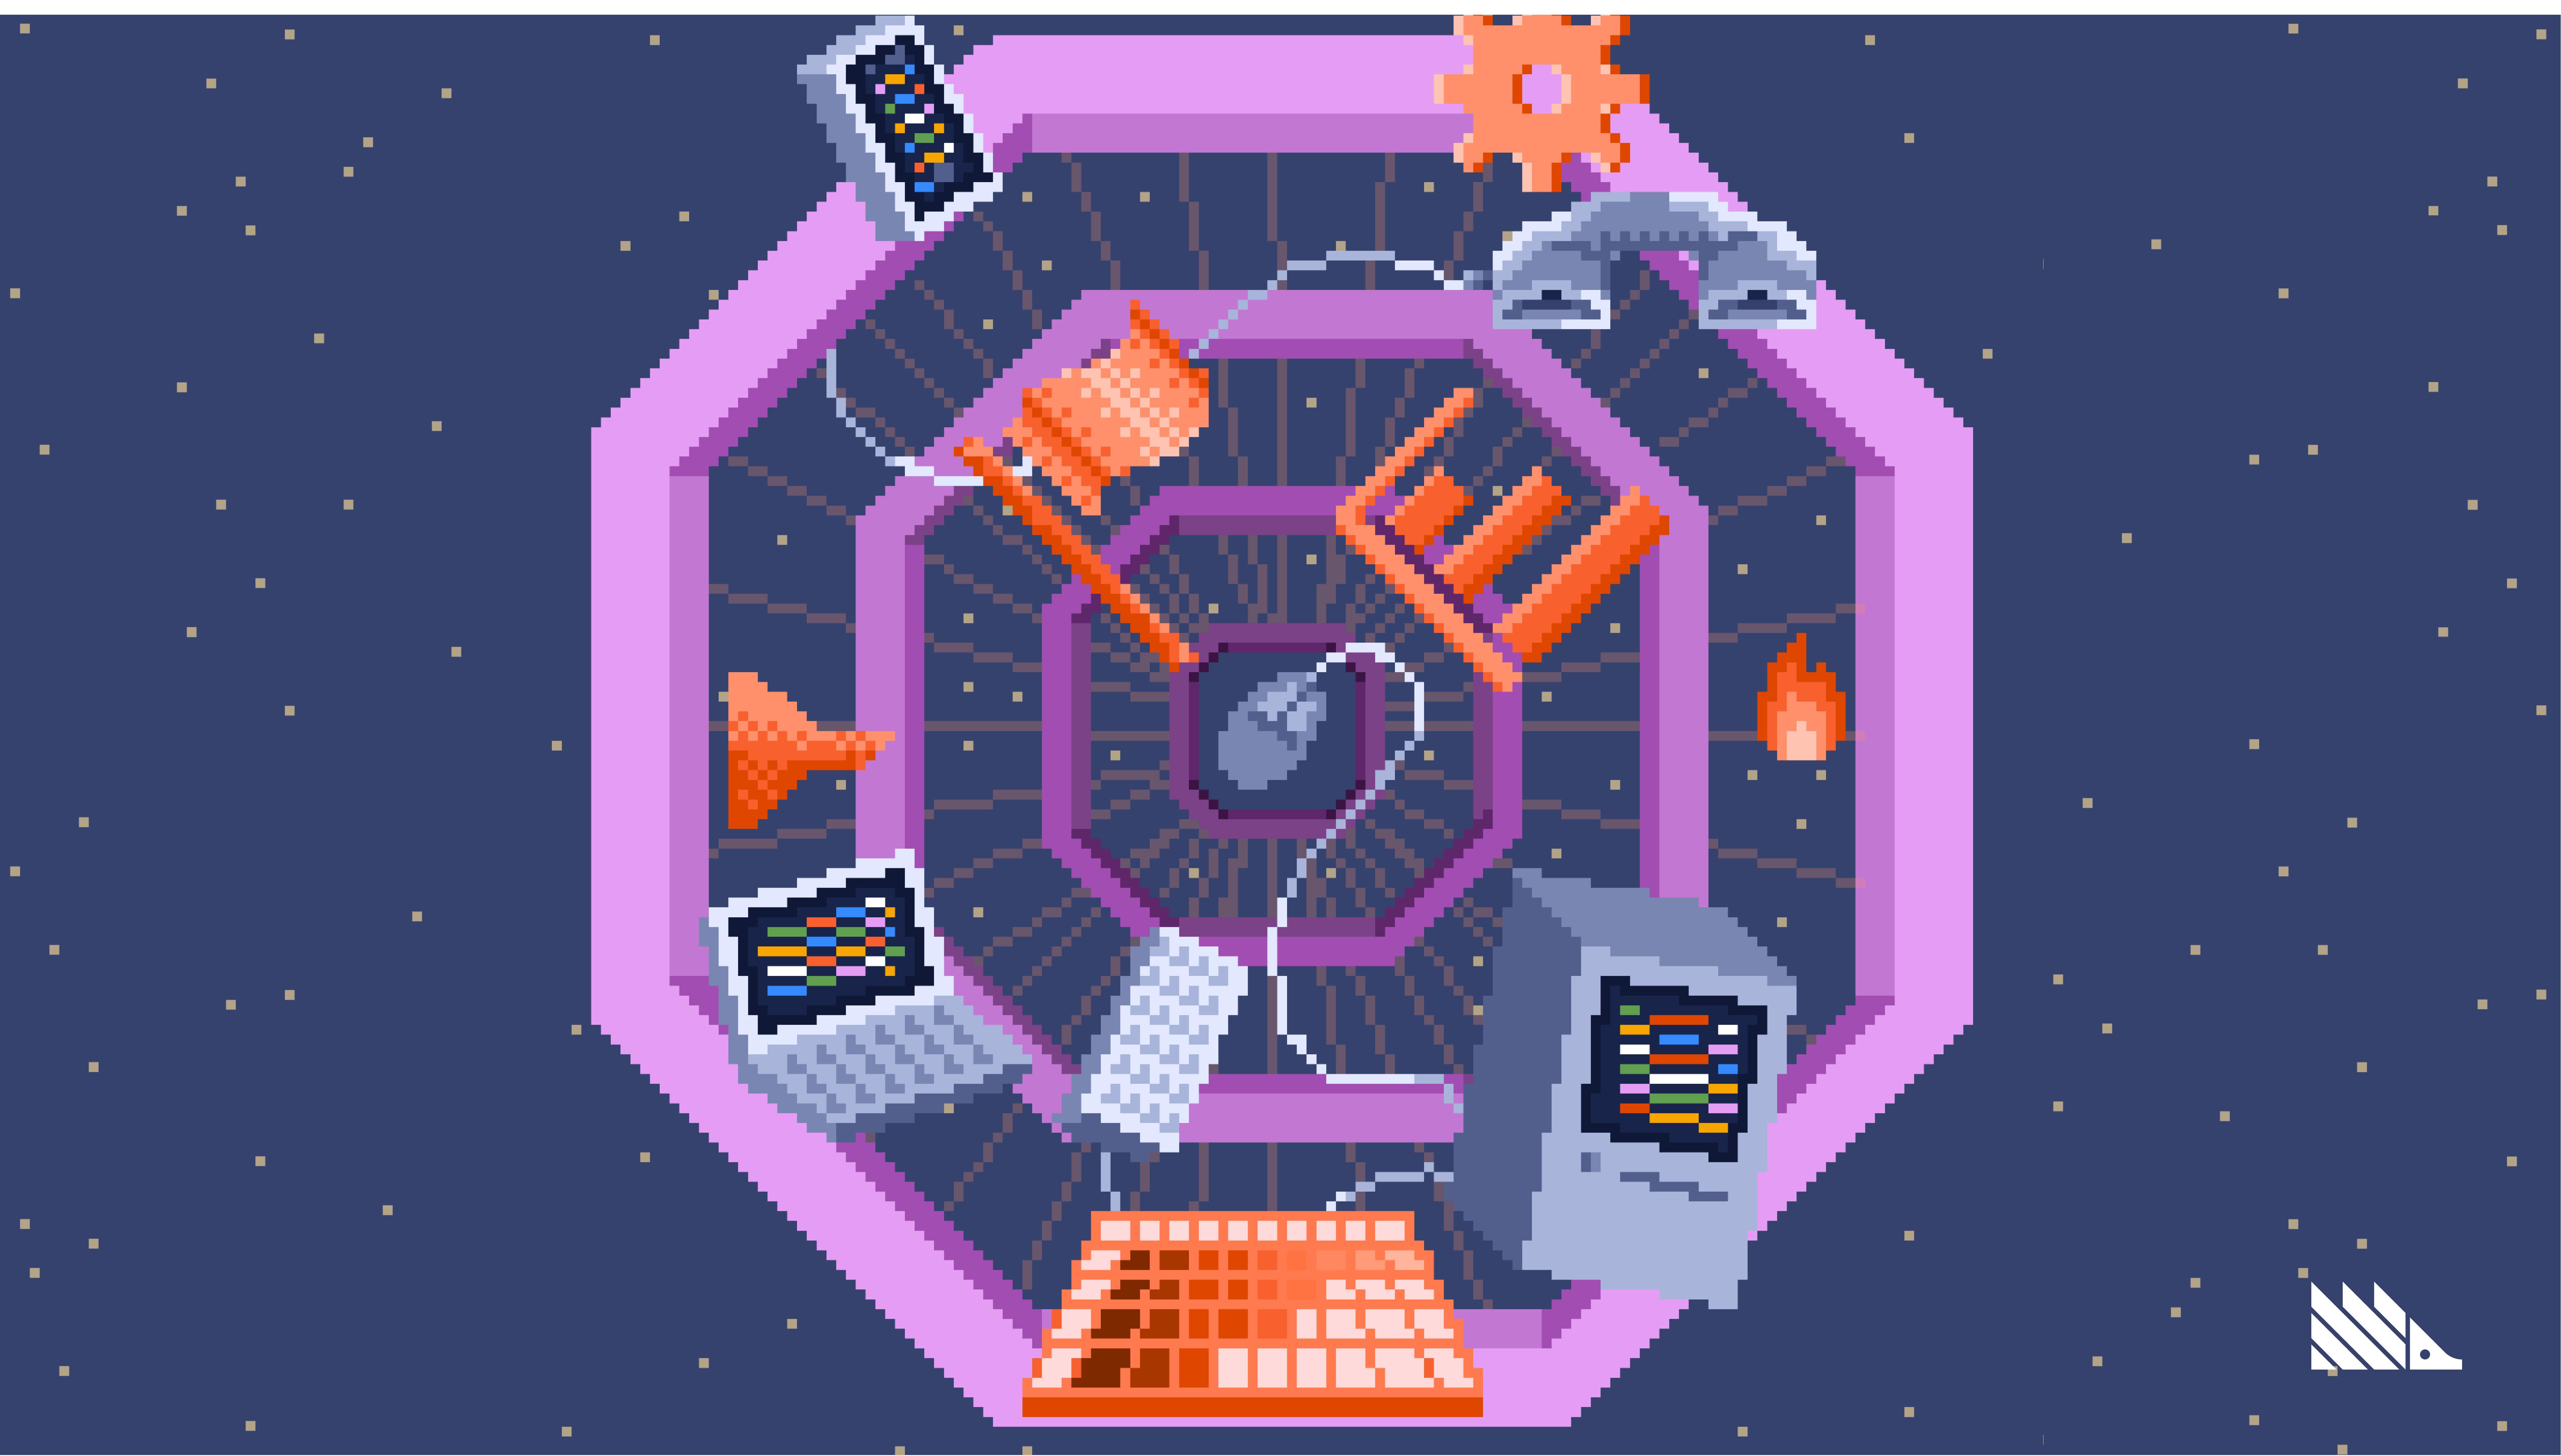 PostHog Background - nexus